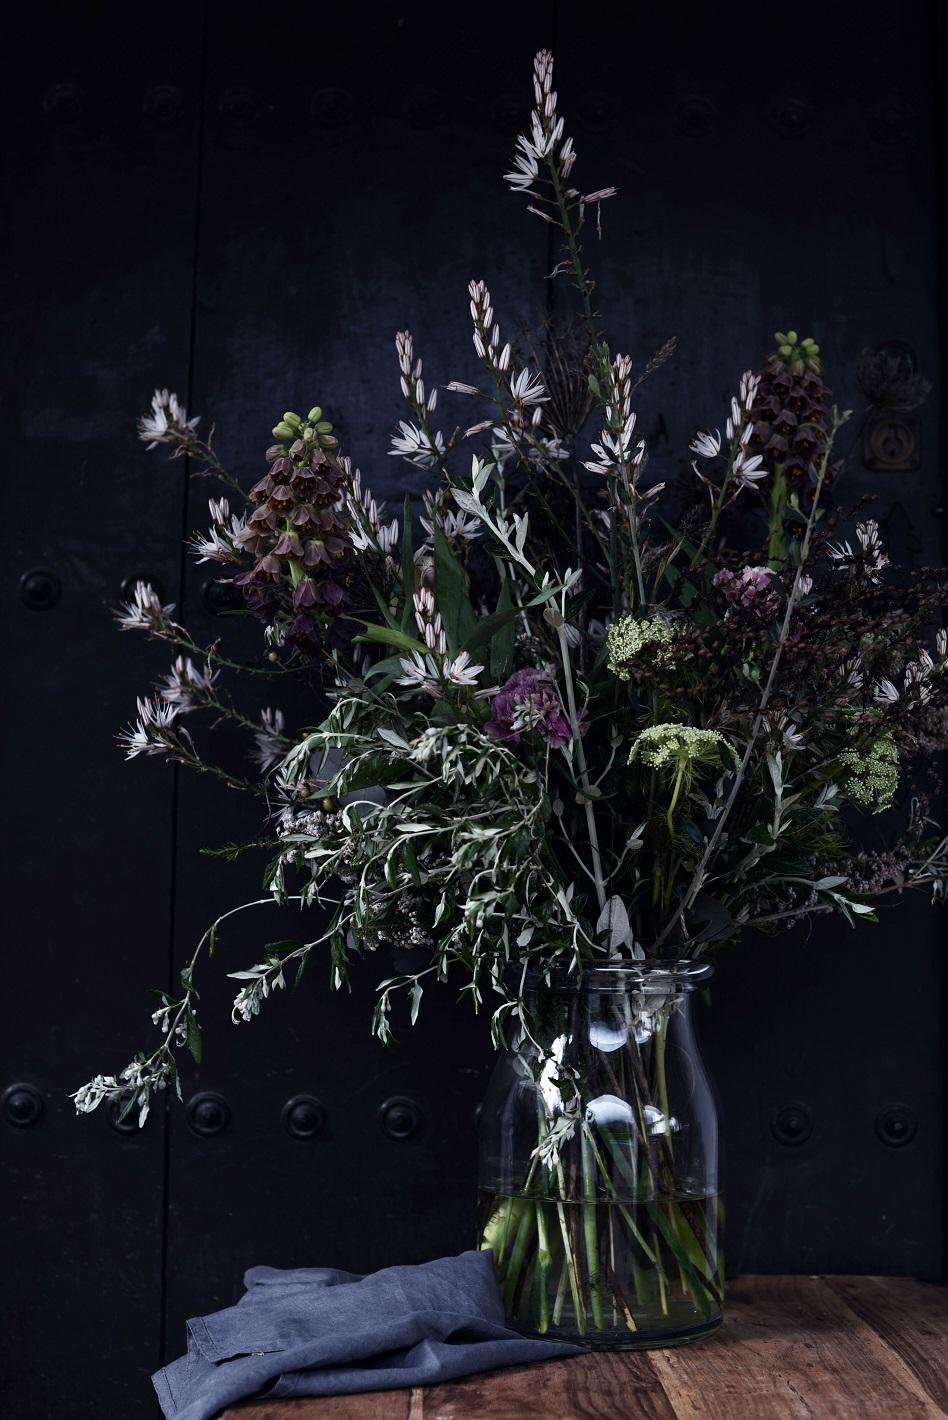 Casares_DianaLovring_Diverse_002_flowers1web.jpg